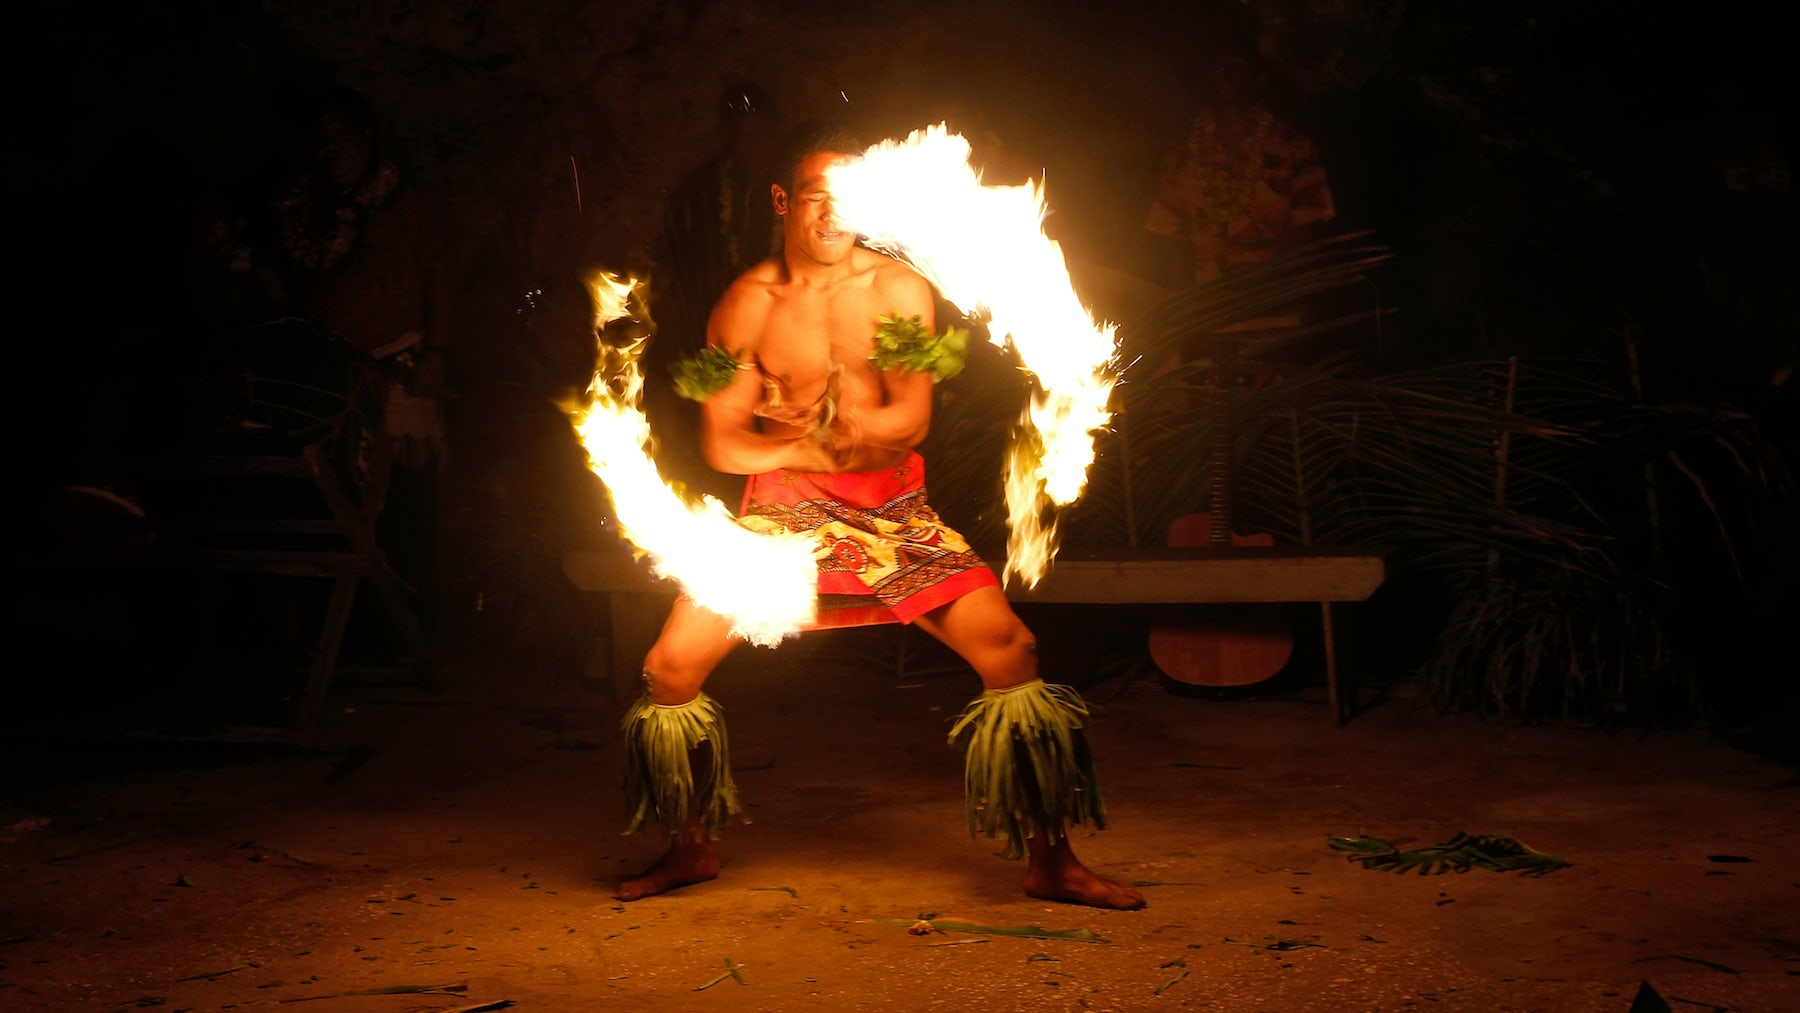 Tongan fire dancer   Source: Shutterstock